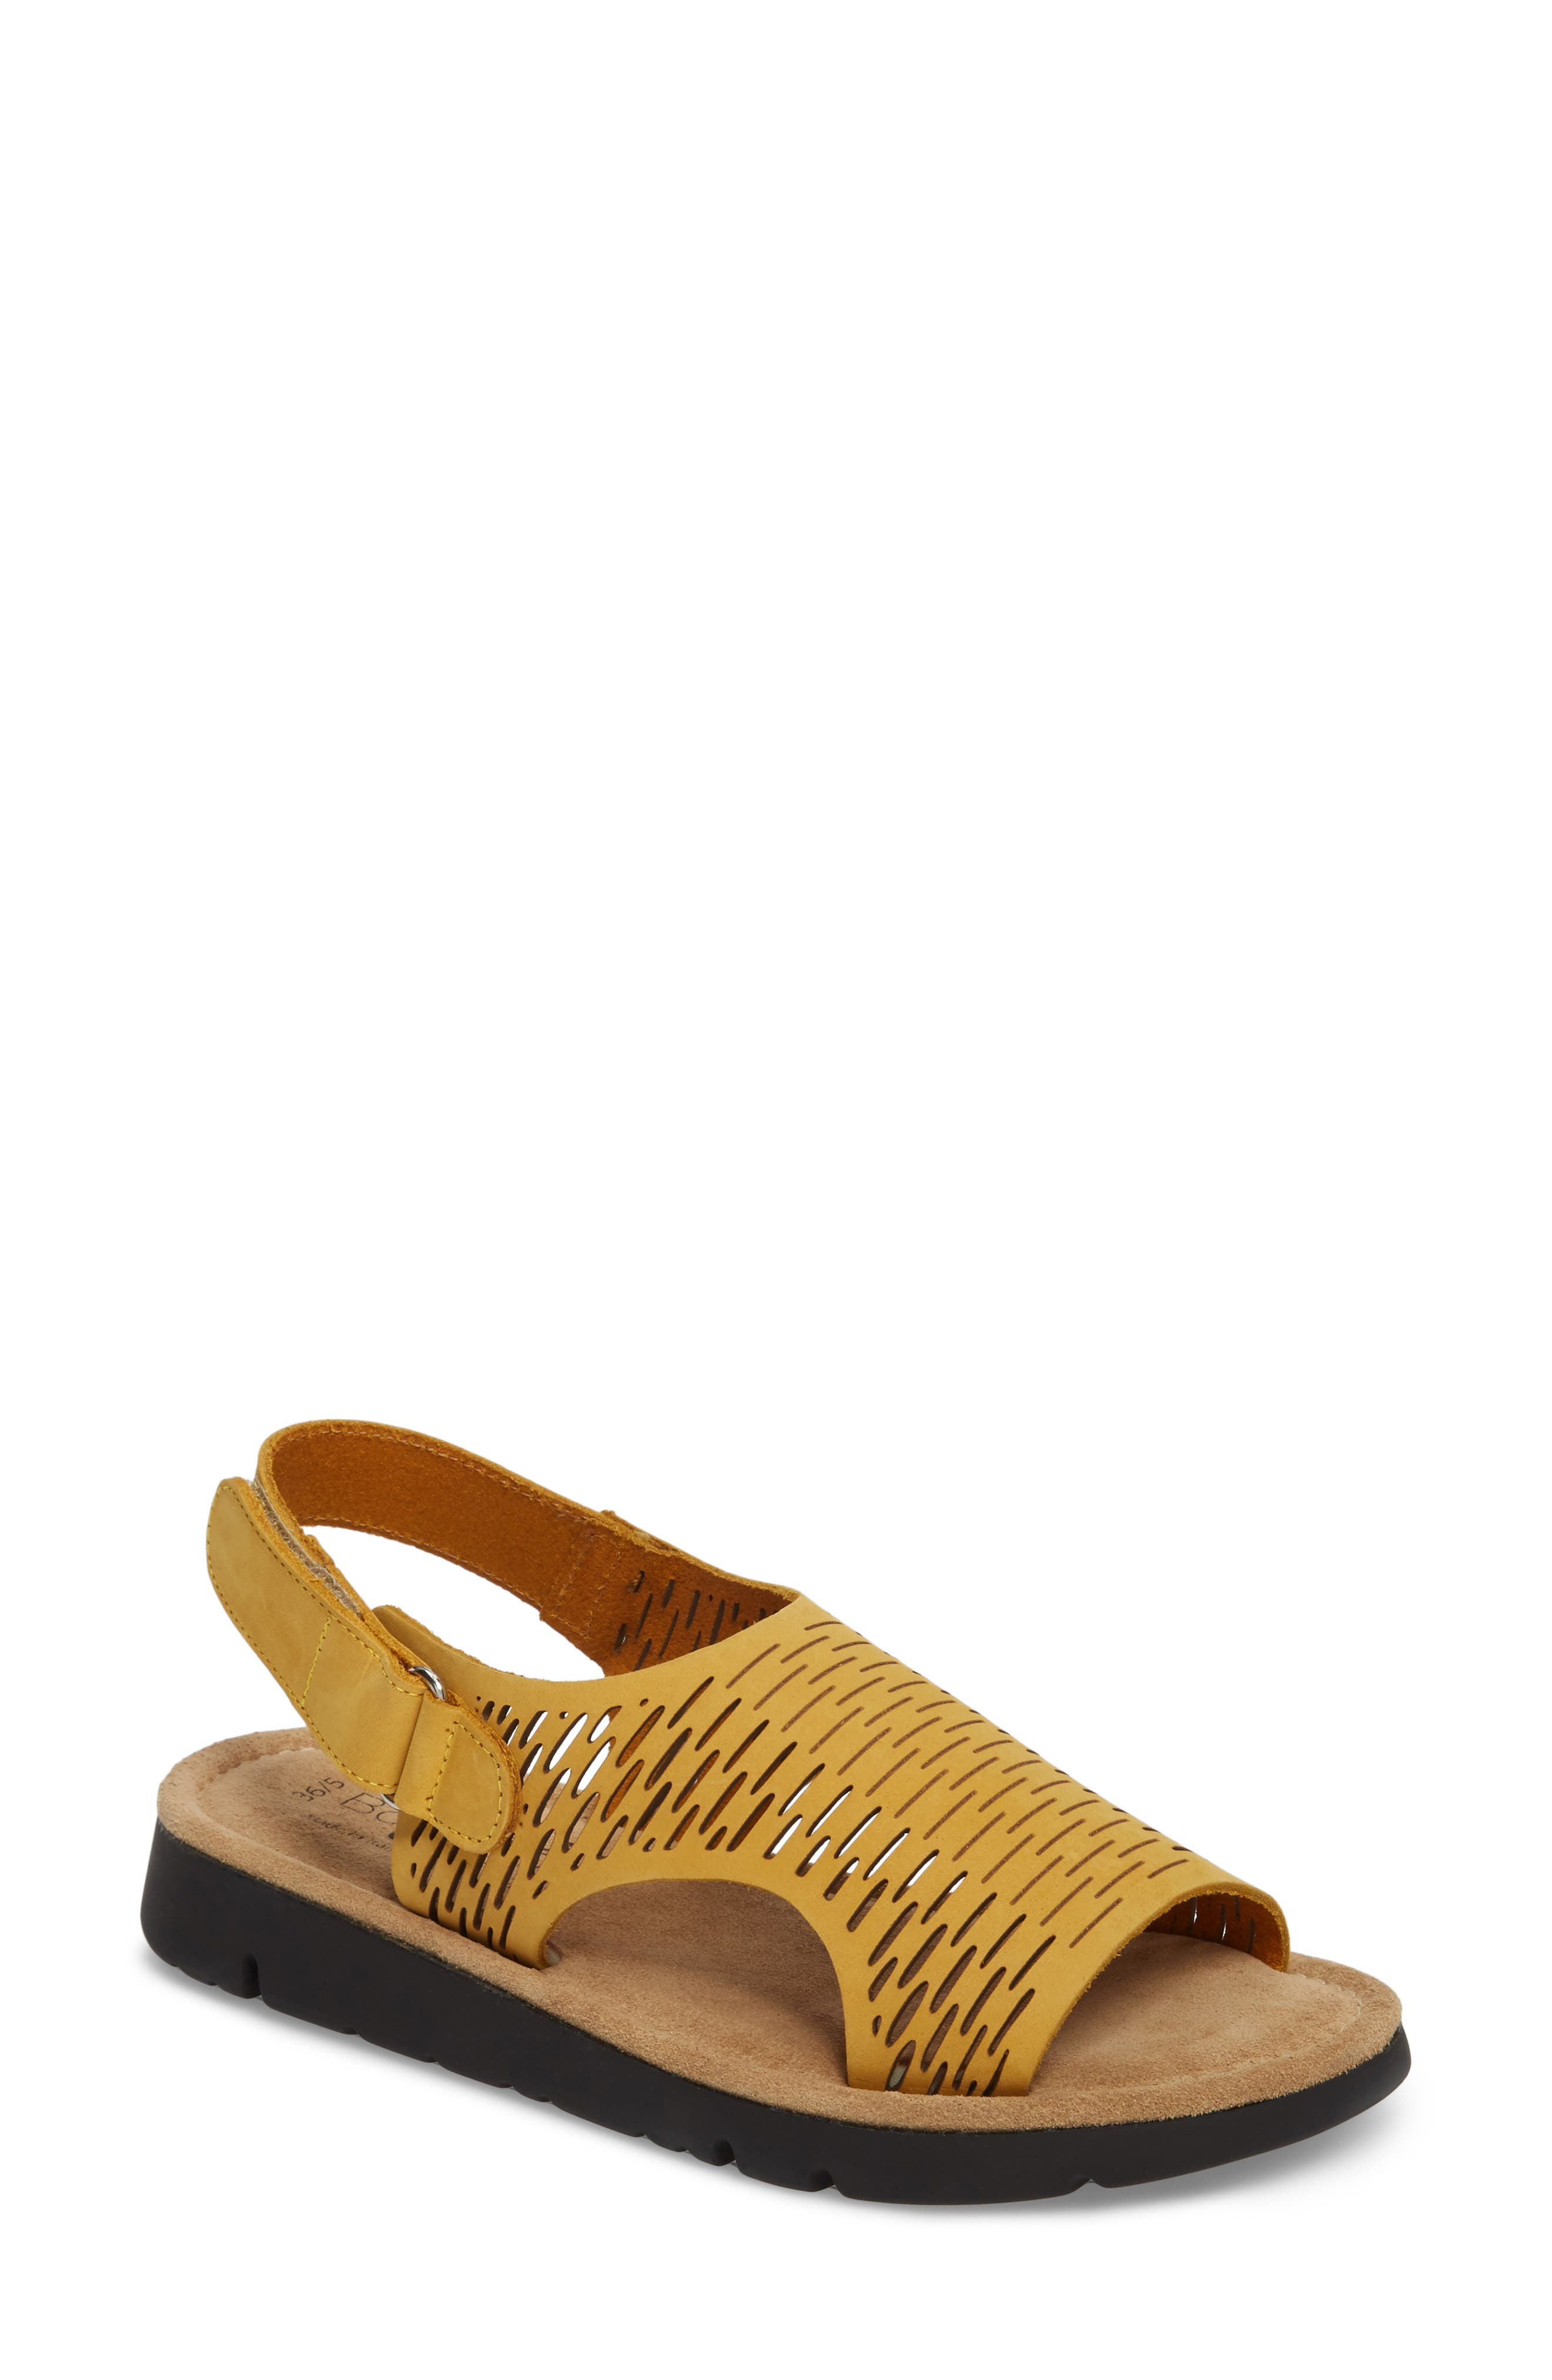 Saga Sandal,                             Main thumbnail 1, color,                             Mustard Nubuck Leather